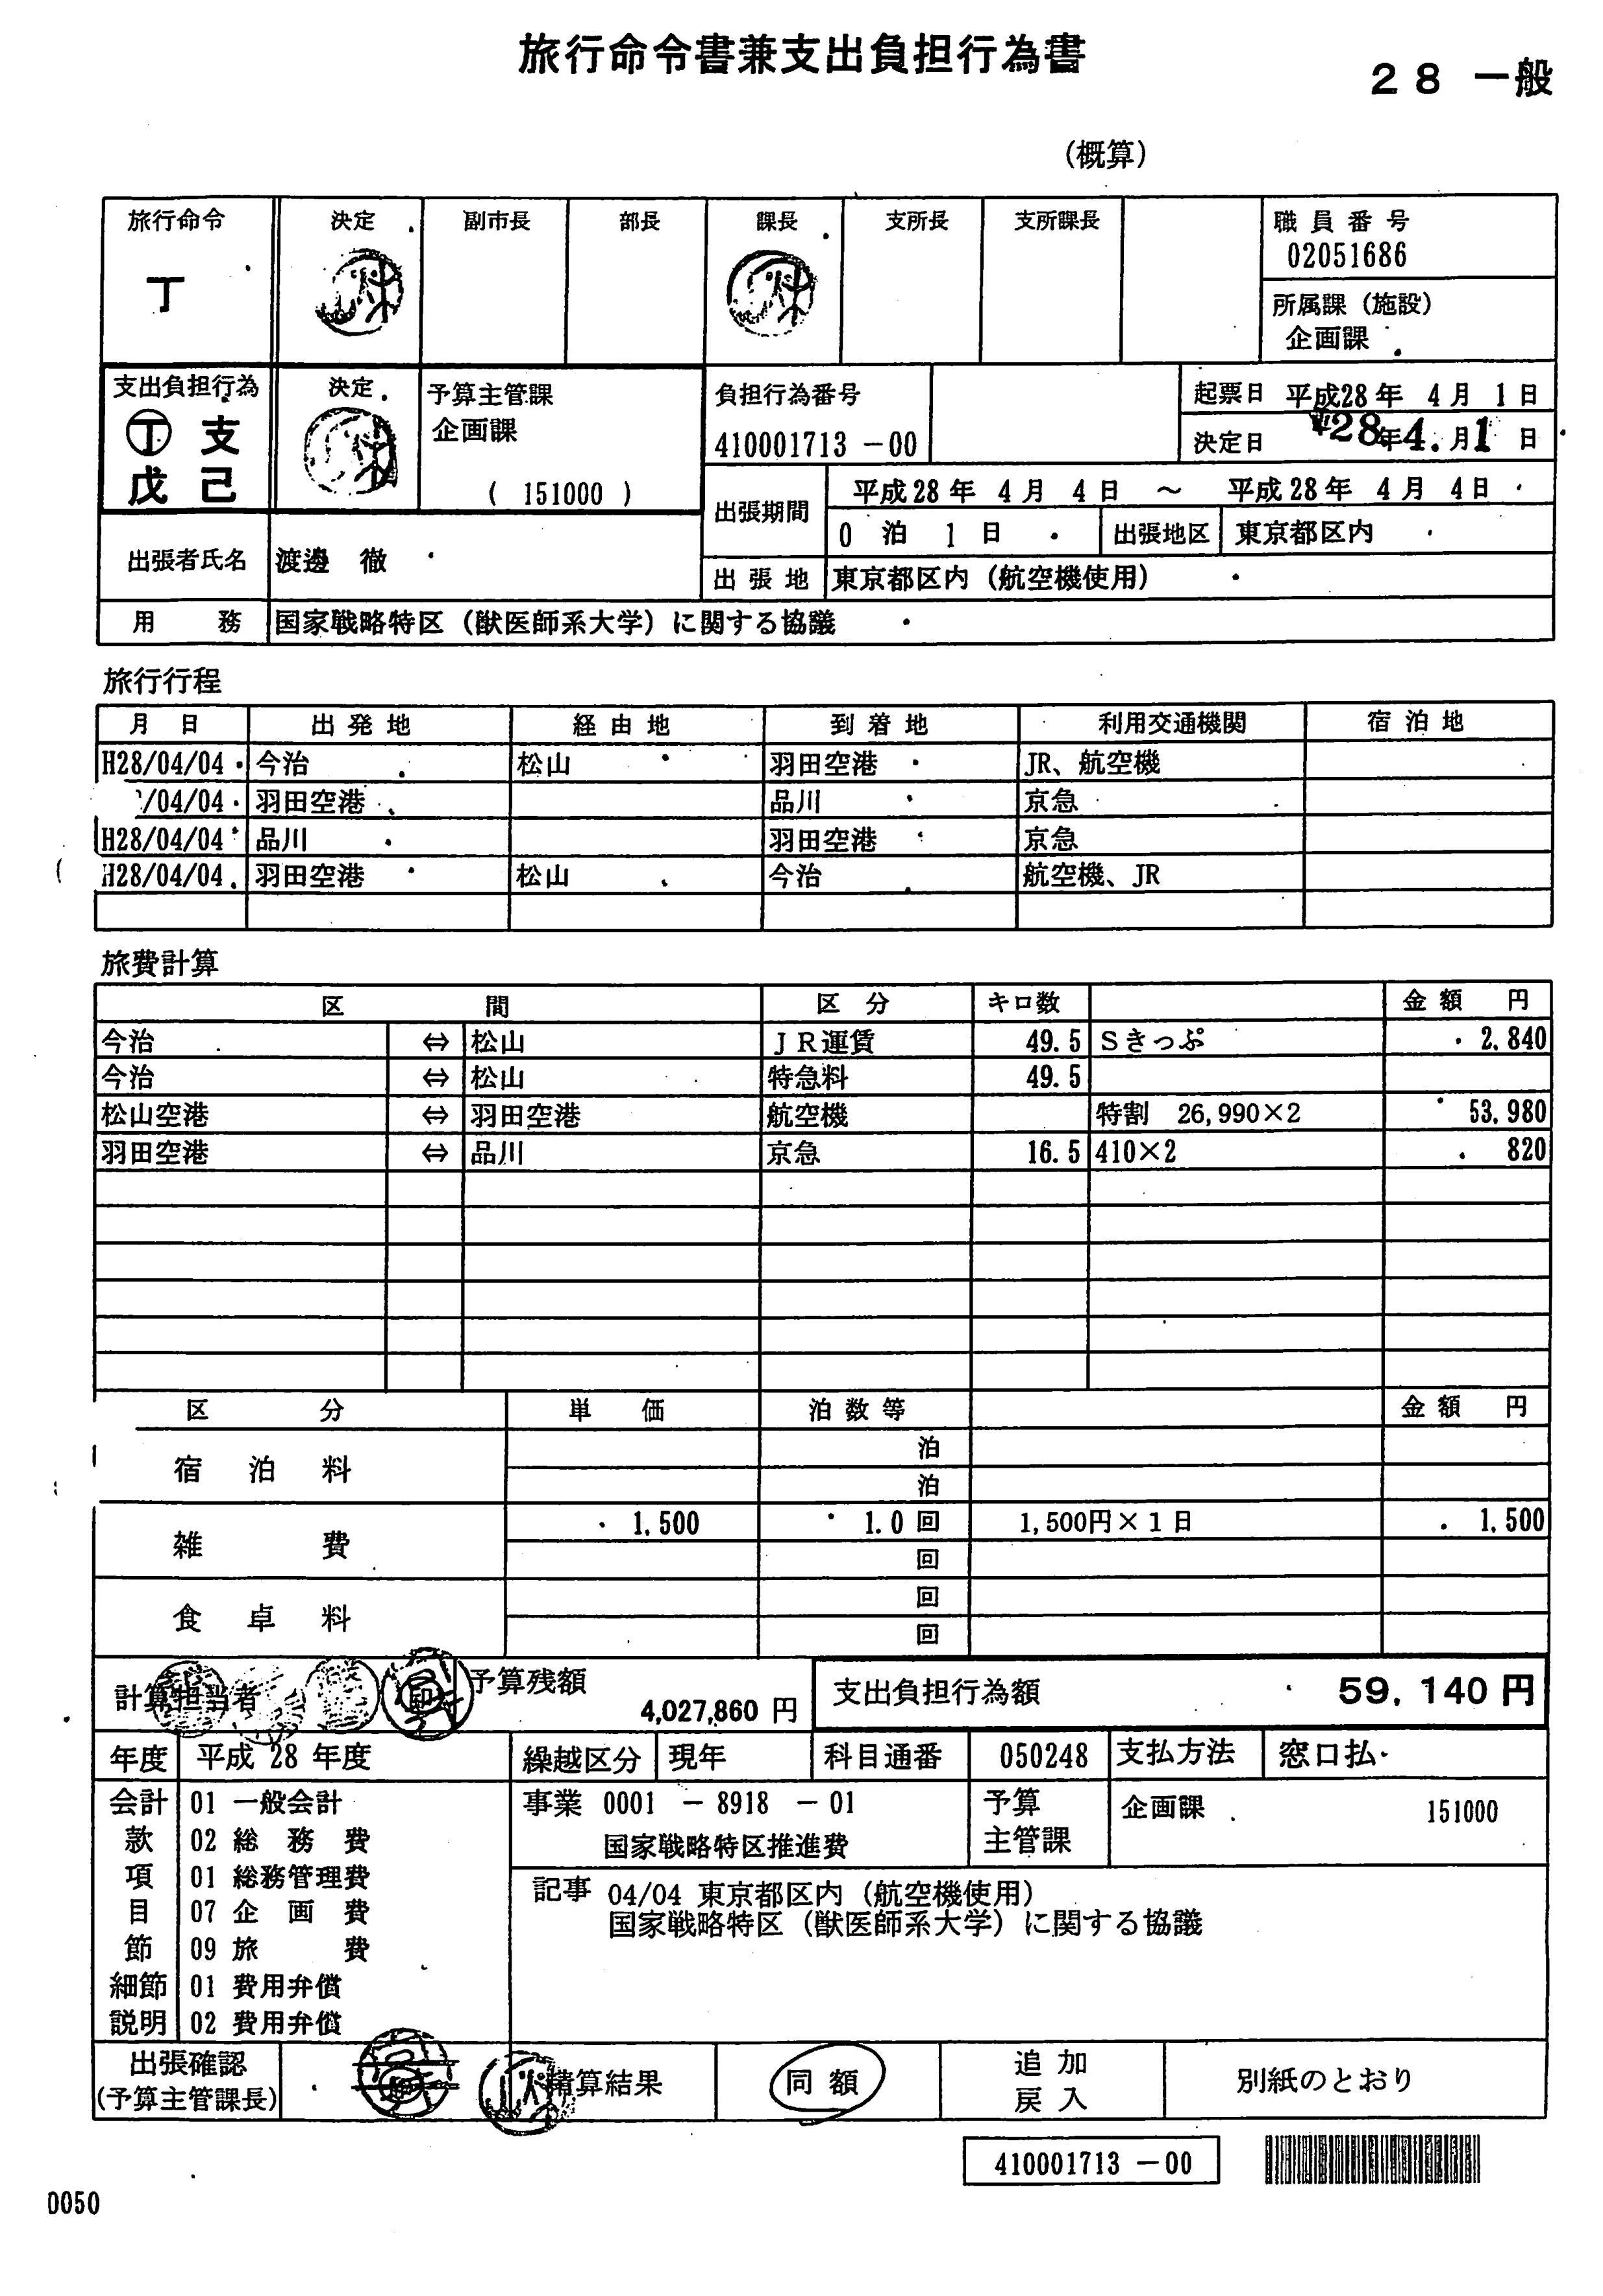 今治市 20160404東京出張 国家戦略特区(大学獣医学部の誘致等)に関する協議 (9)